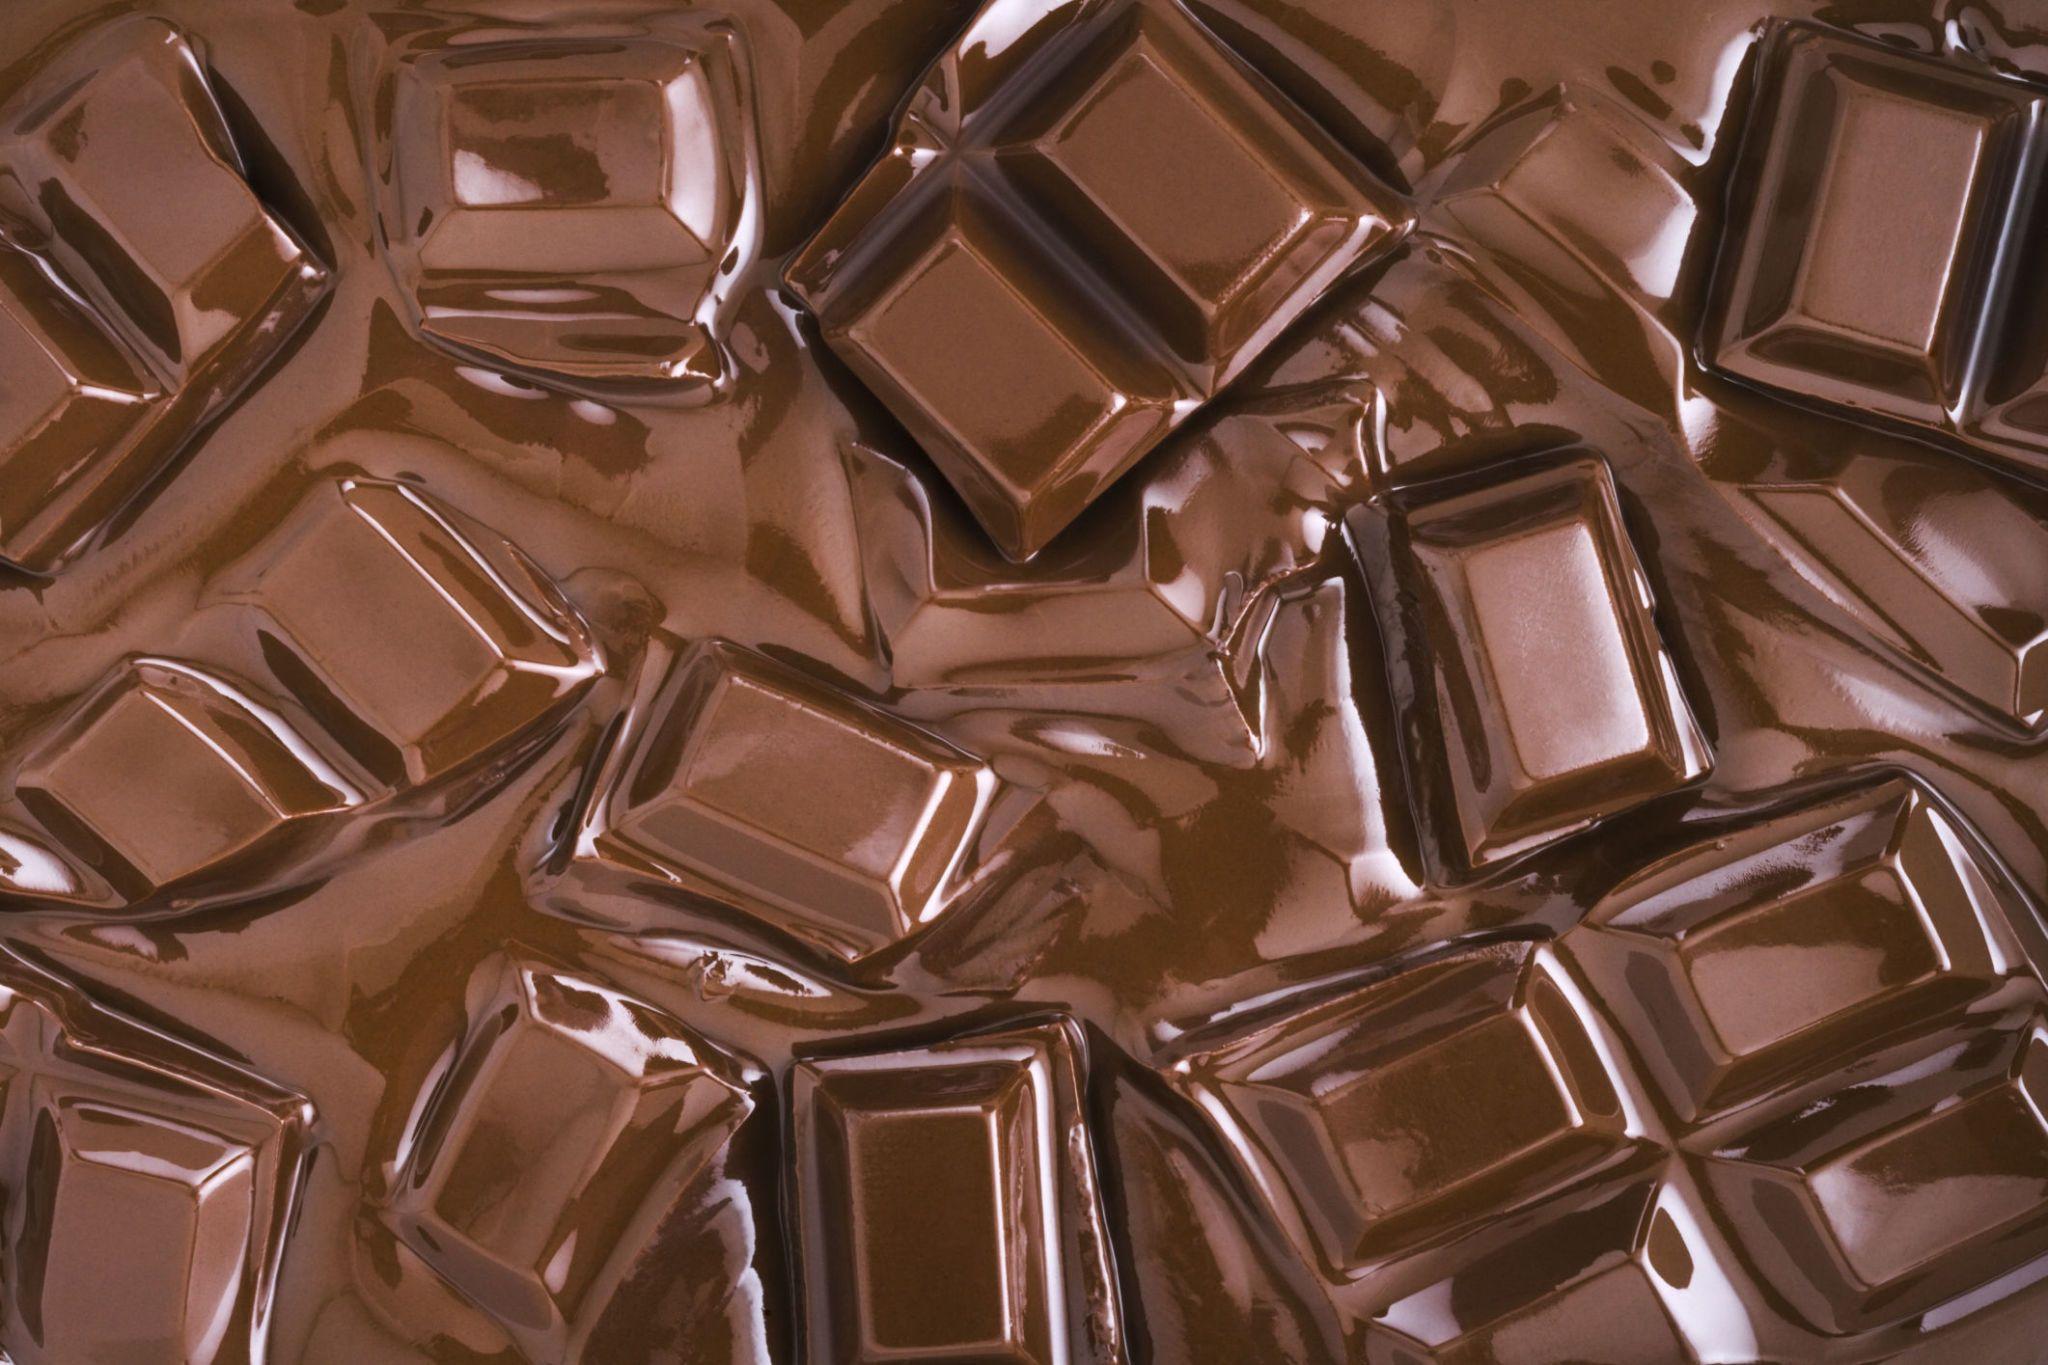 national chocolate day 2019 freebies